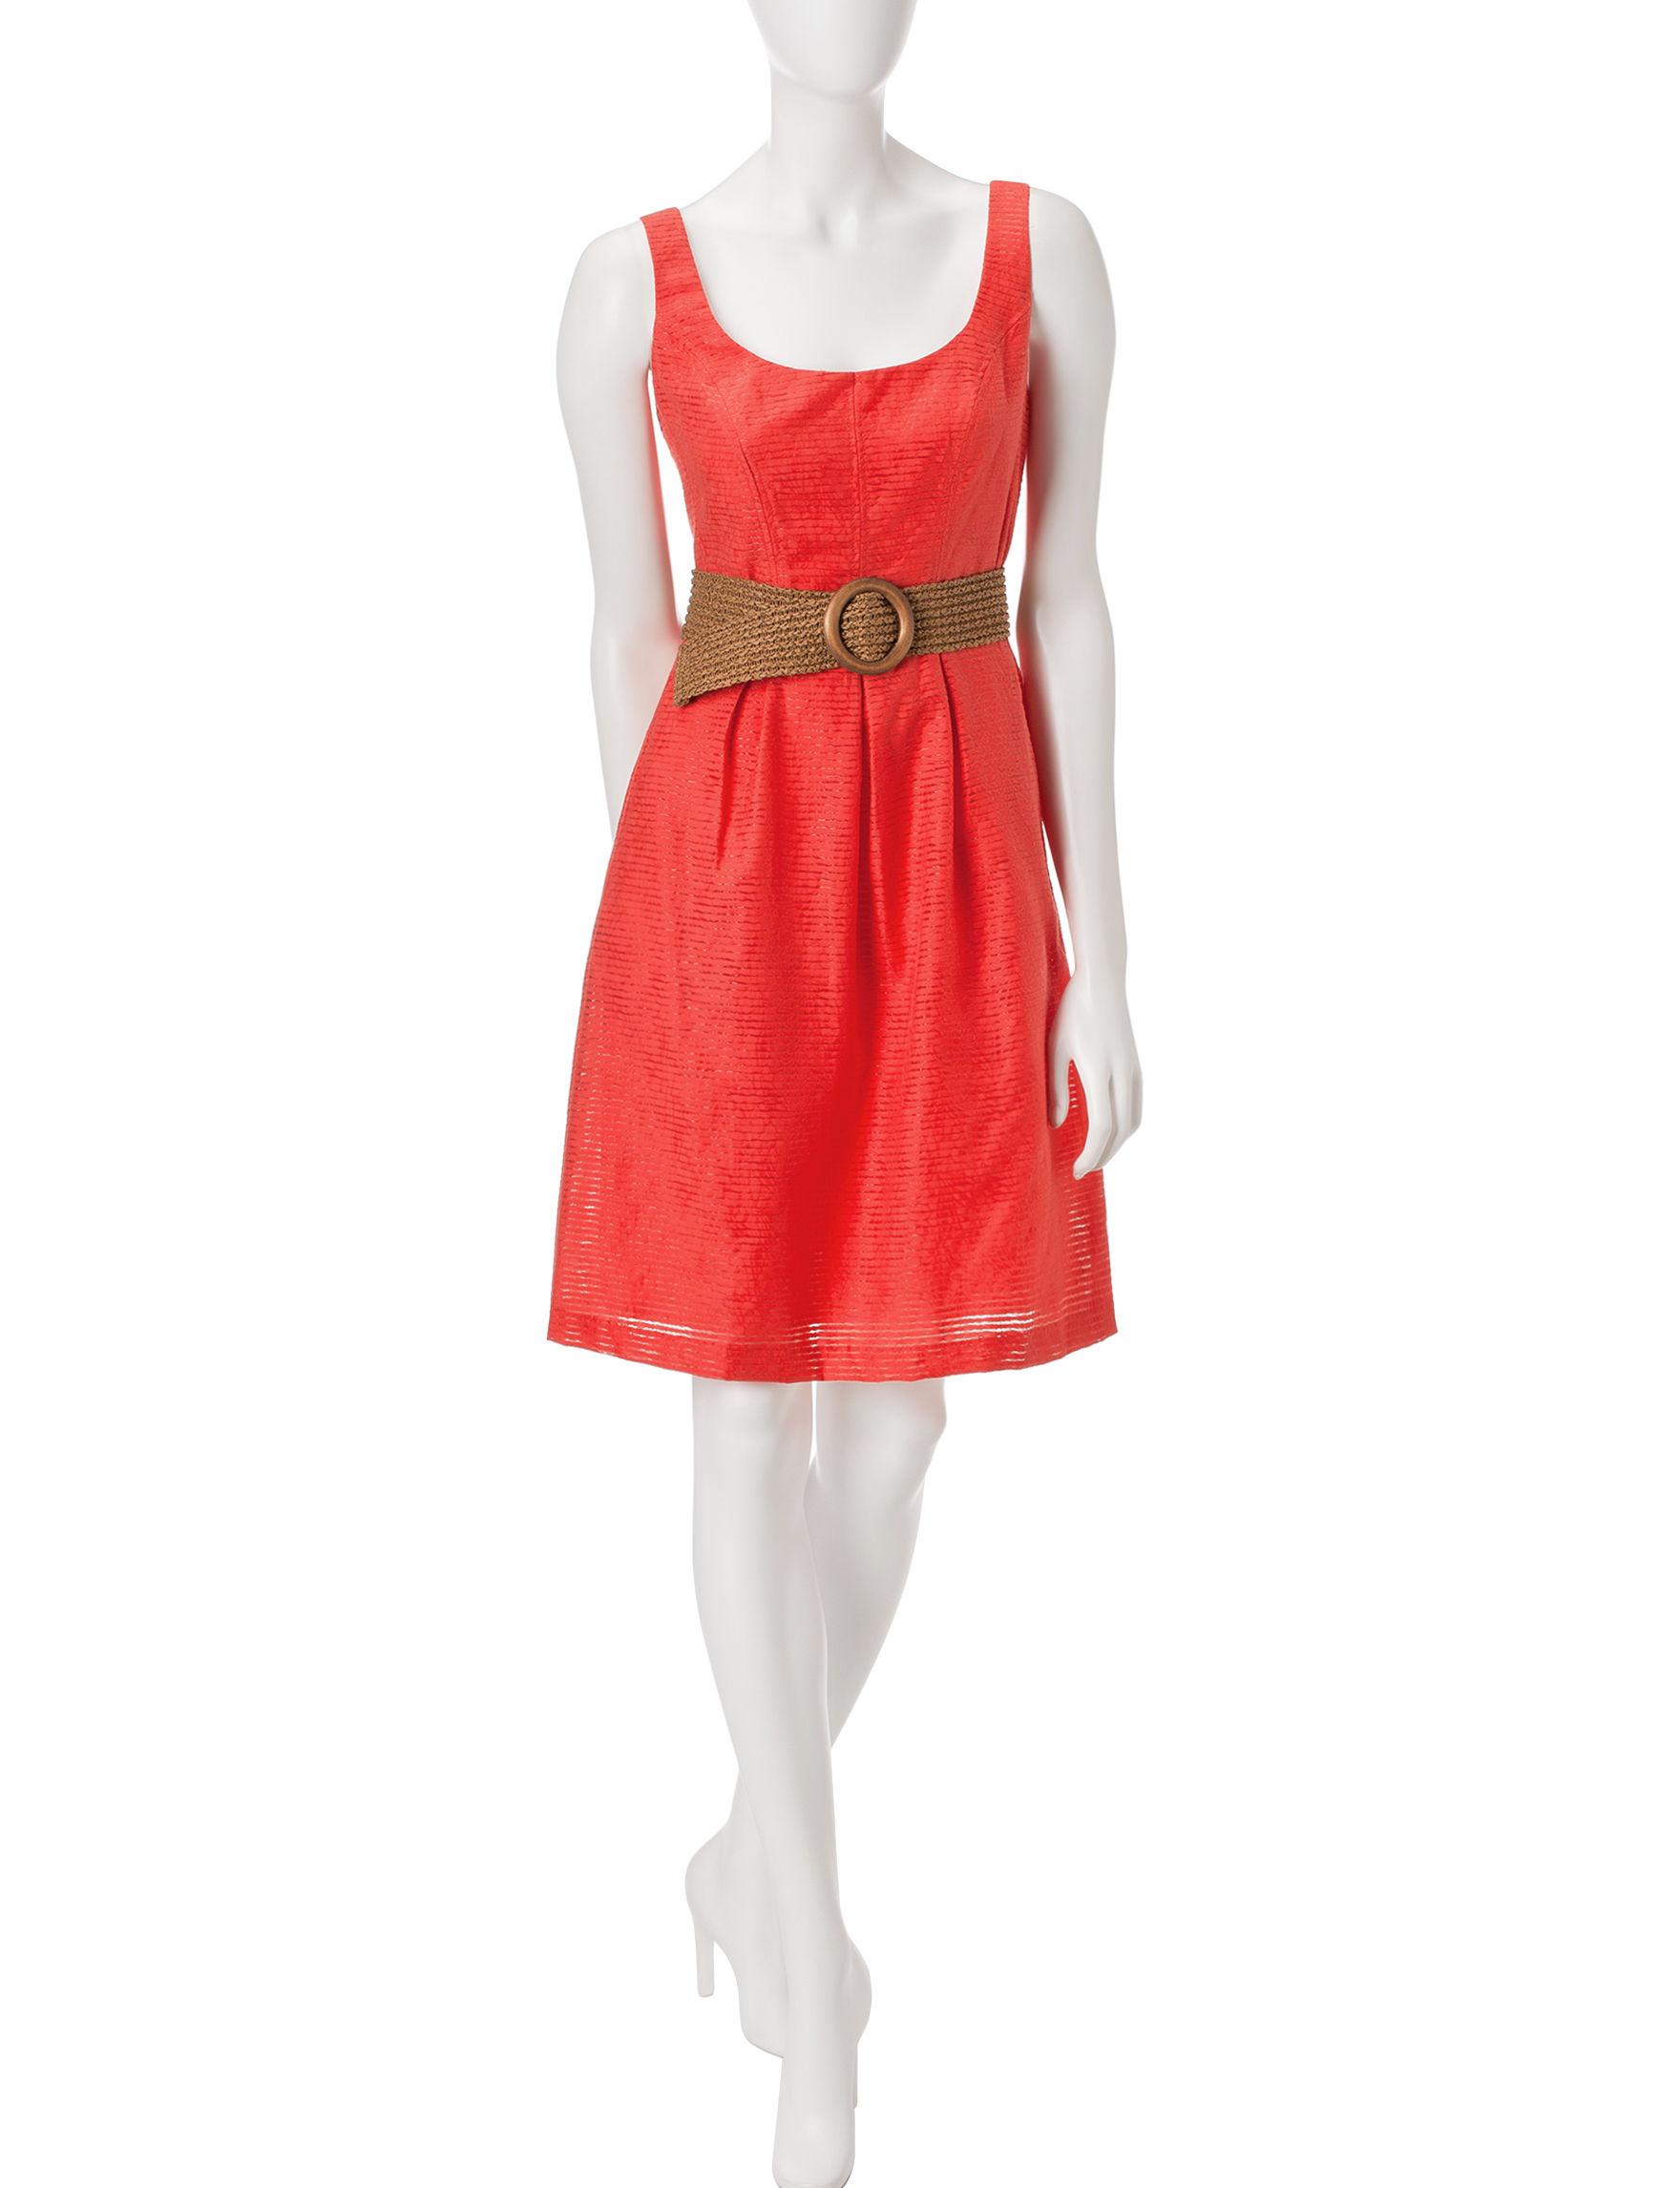 Nine West Orange Everyday & Casual A-line Dresses